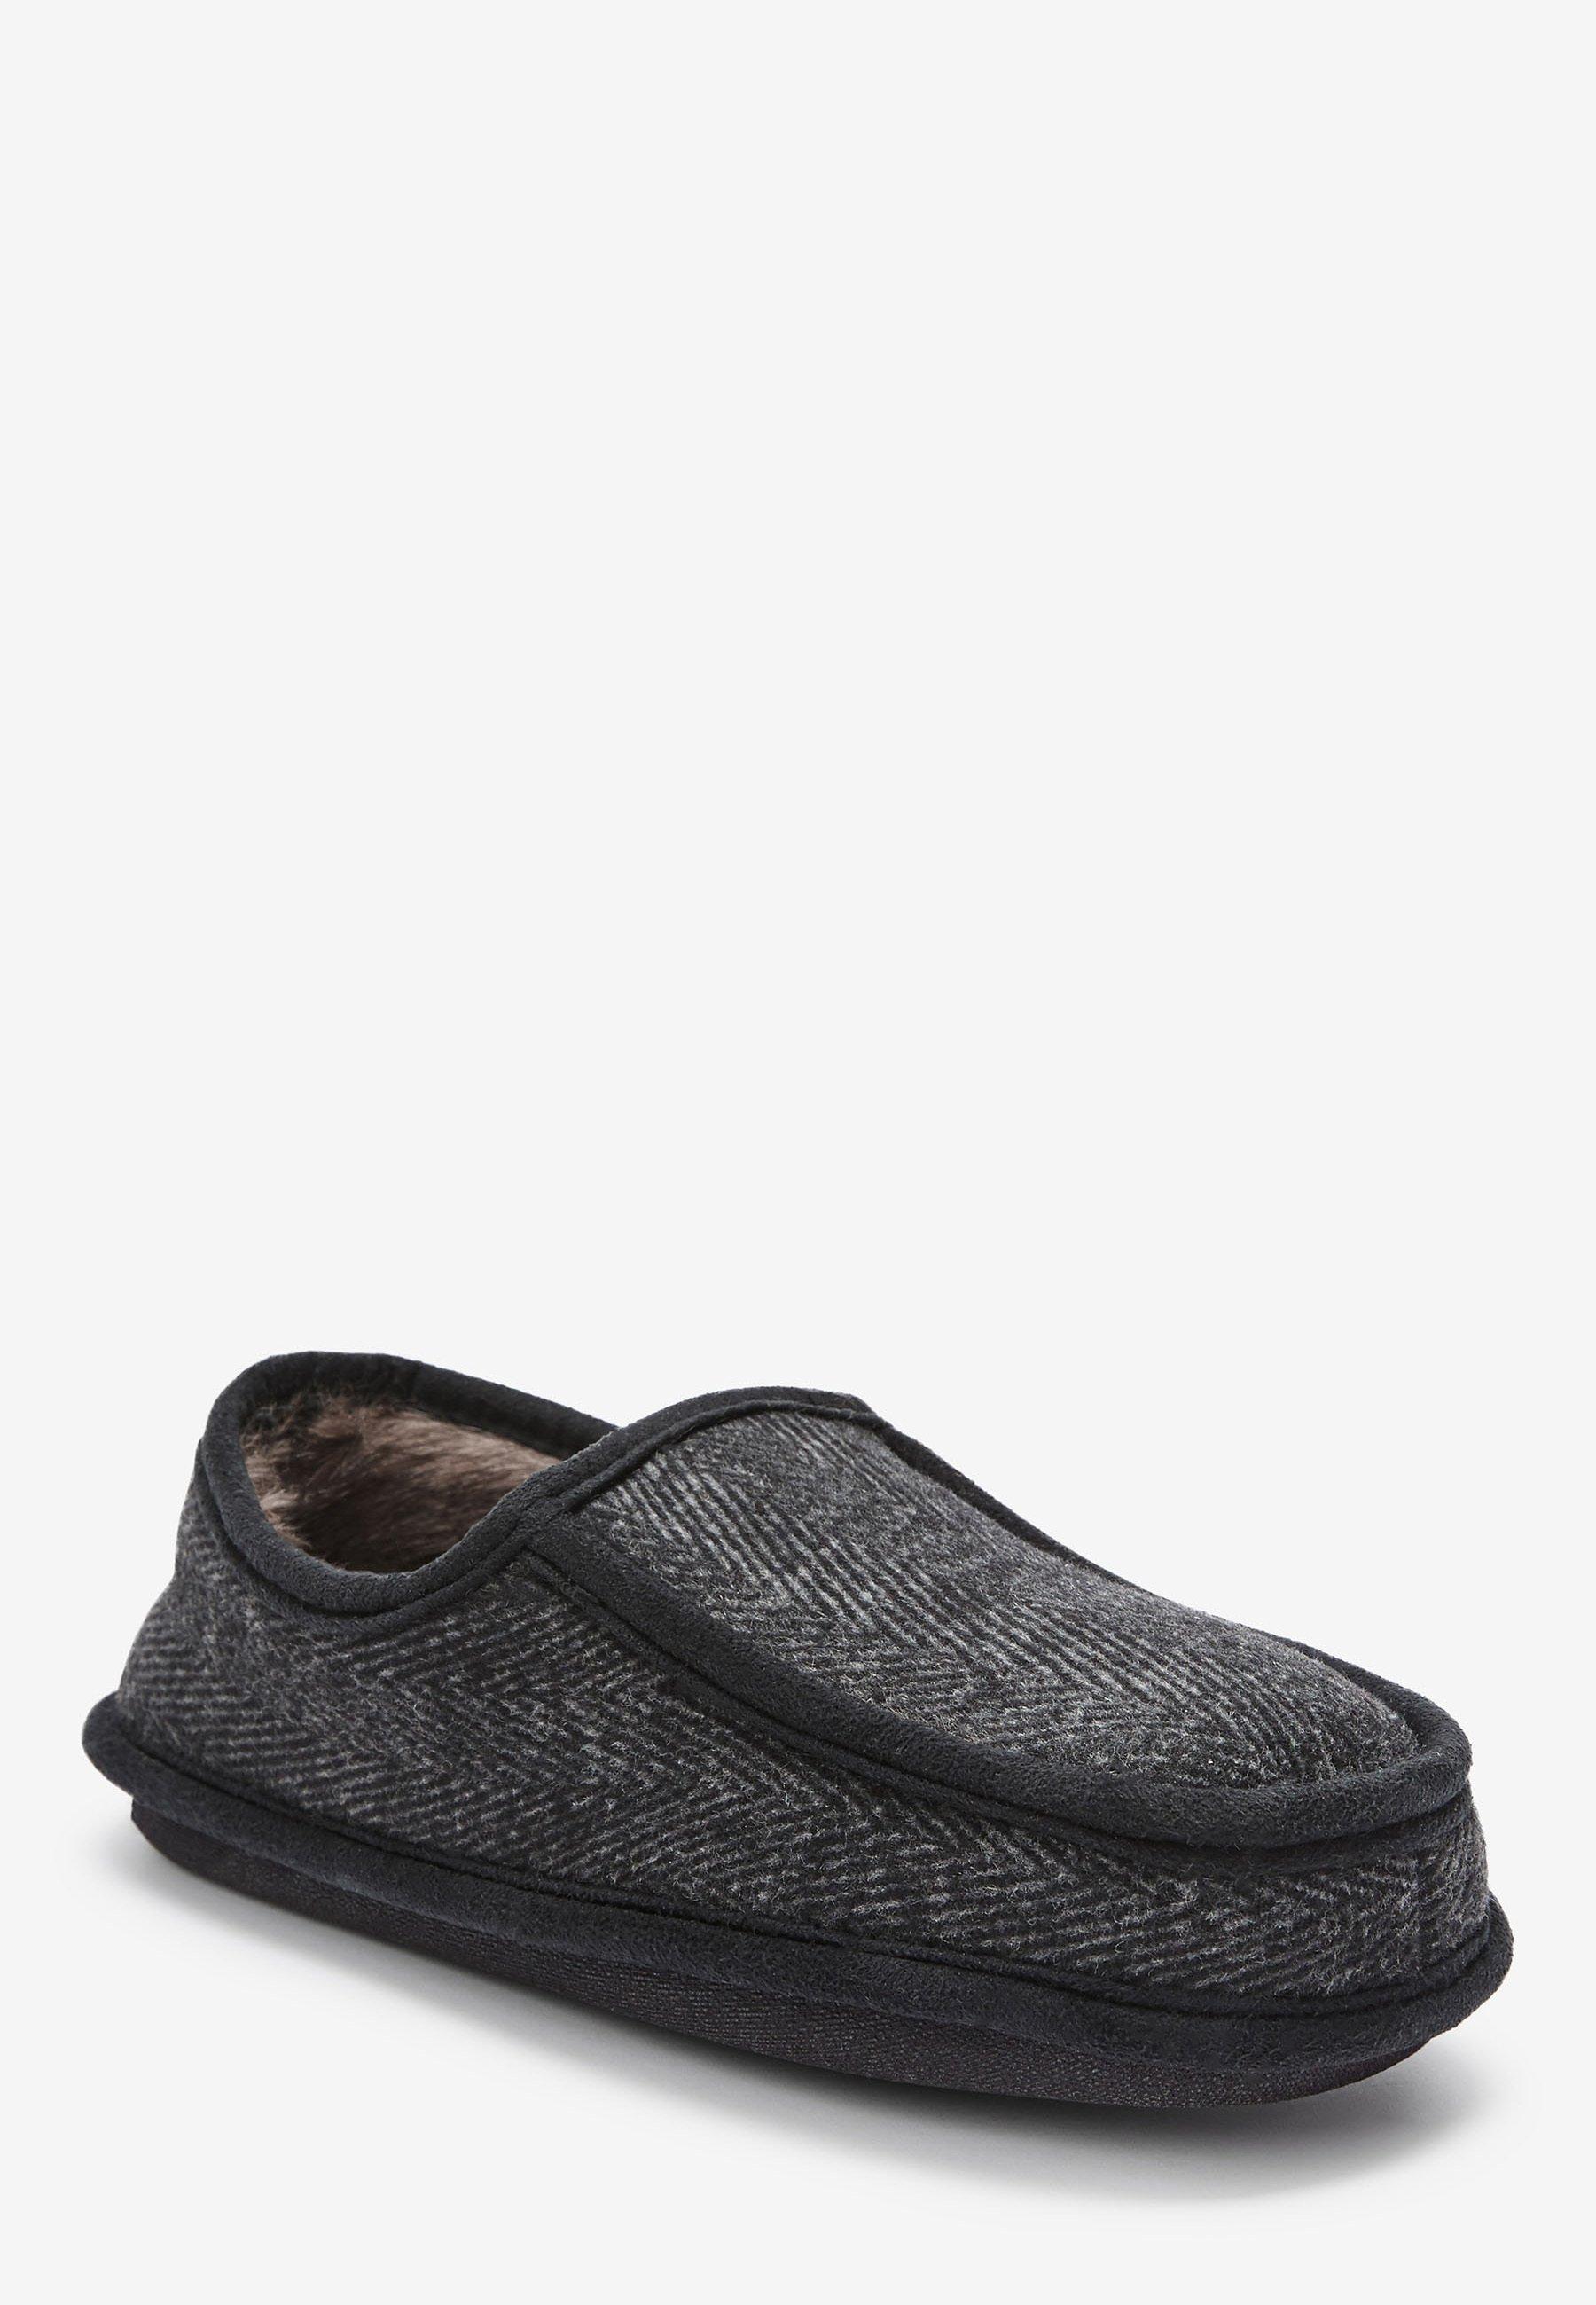 Next Slip-ins - grey/grå - Herrskor AvNCx